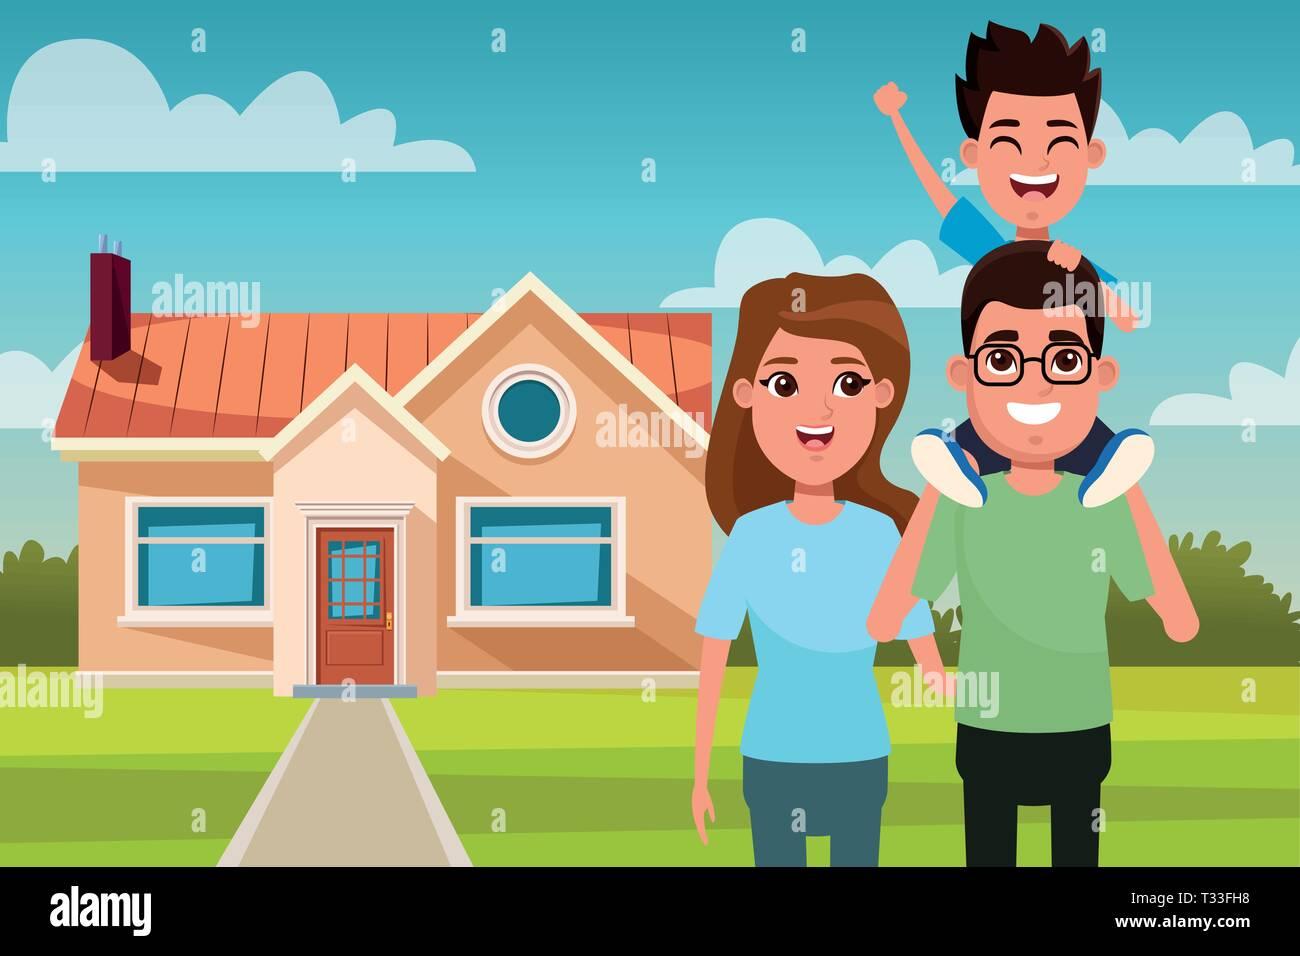 Family Cartoon High Resolution Stock Photography And Images Alamy Caricature artist draw cartoon portrait & custom cartoon design. https www alamy com family outdoors from home cartoon image242867220 html